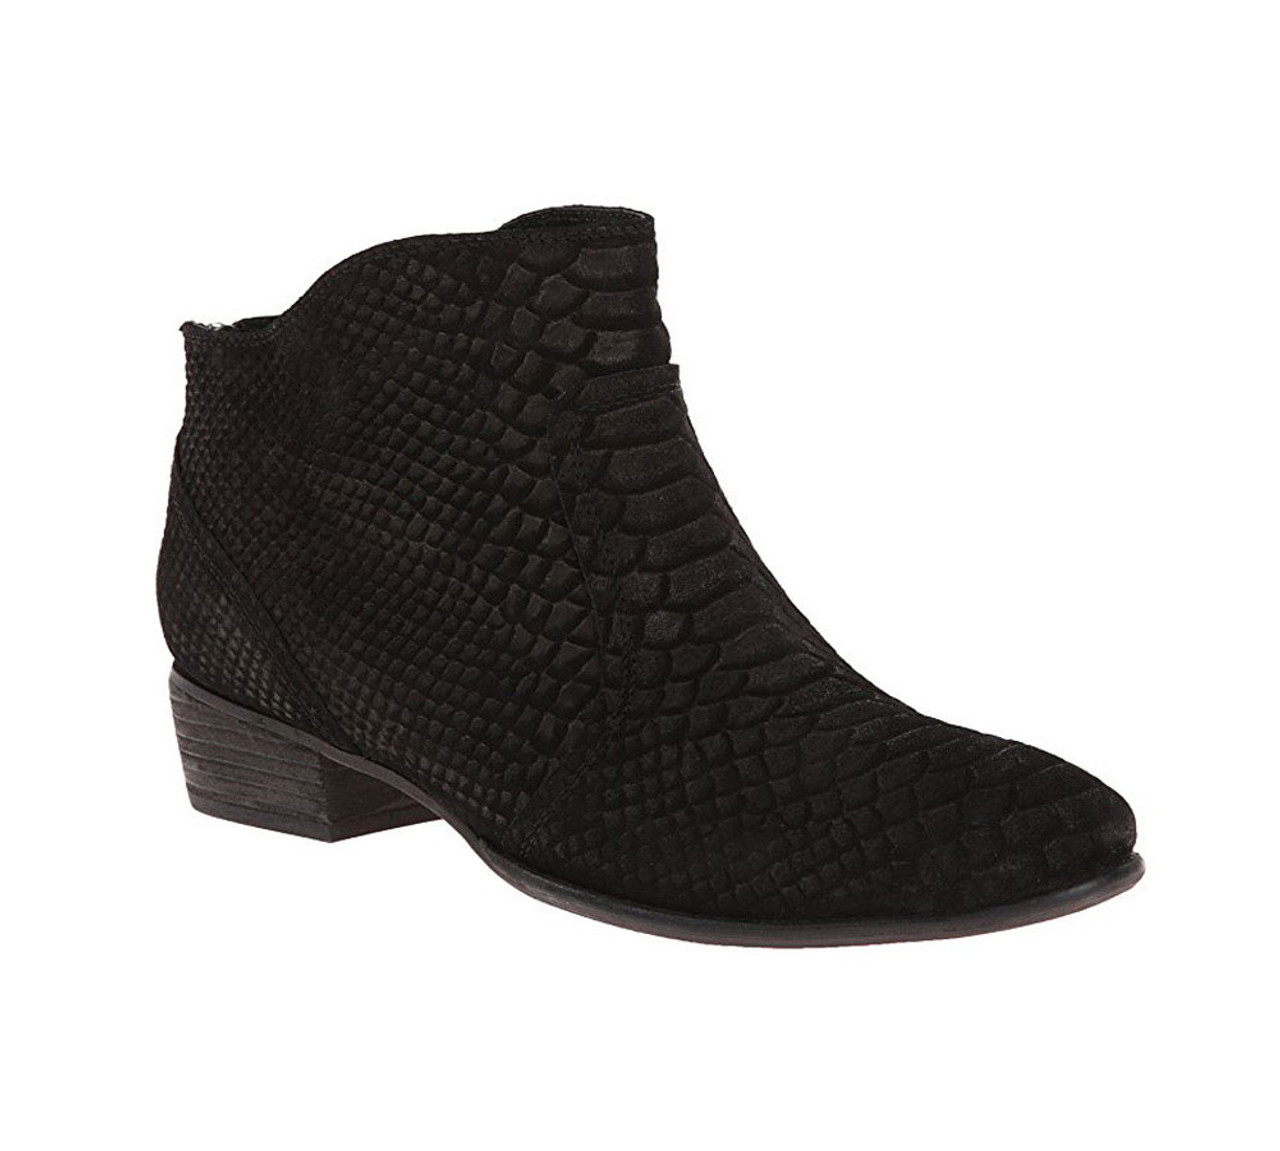 ... Seychelles Women's Reunited Boot Black Exotic.  https://d3d71ba2asa5oz.cloudfront.net/42000201/images/reunited-